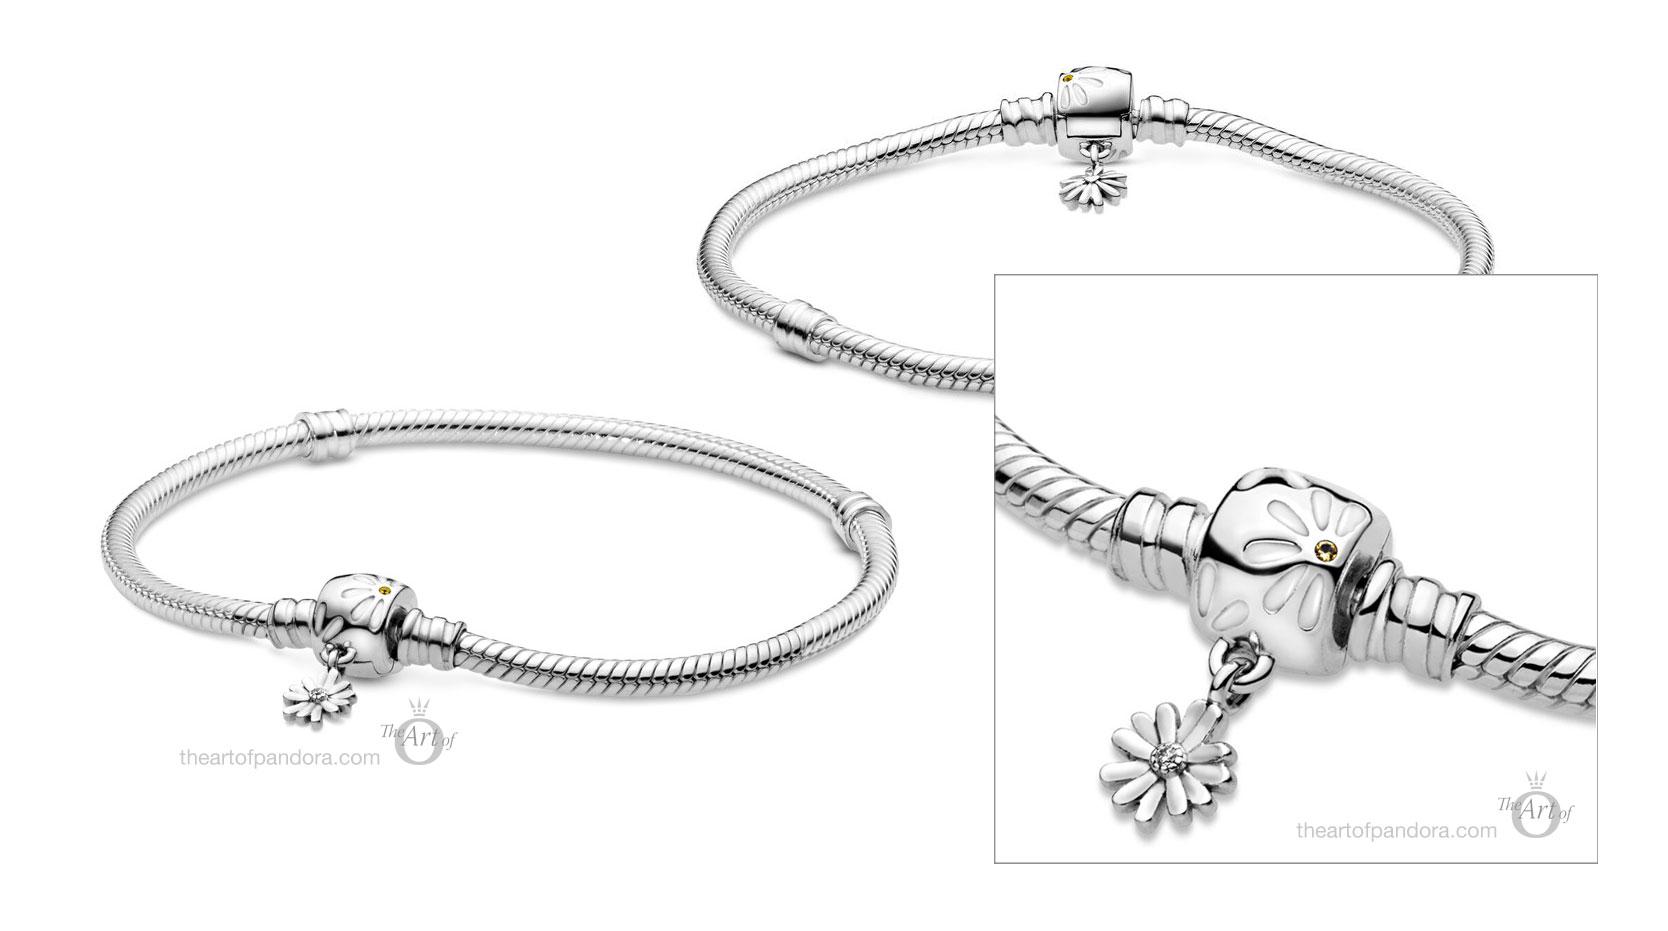 598776c01 Pandora Moments Daisy Flower Clasp Snake Chain Bracelet The Art Of Pandora The 1 Pandora Blog